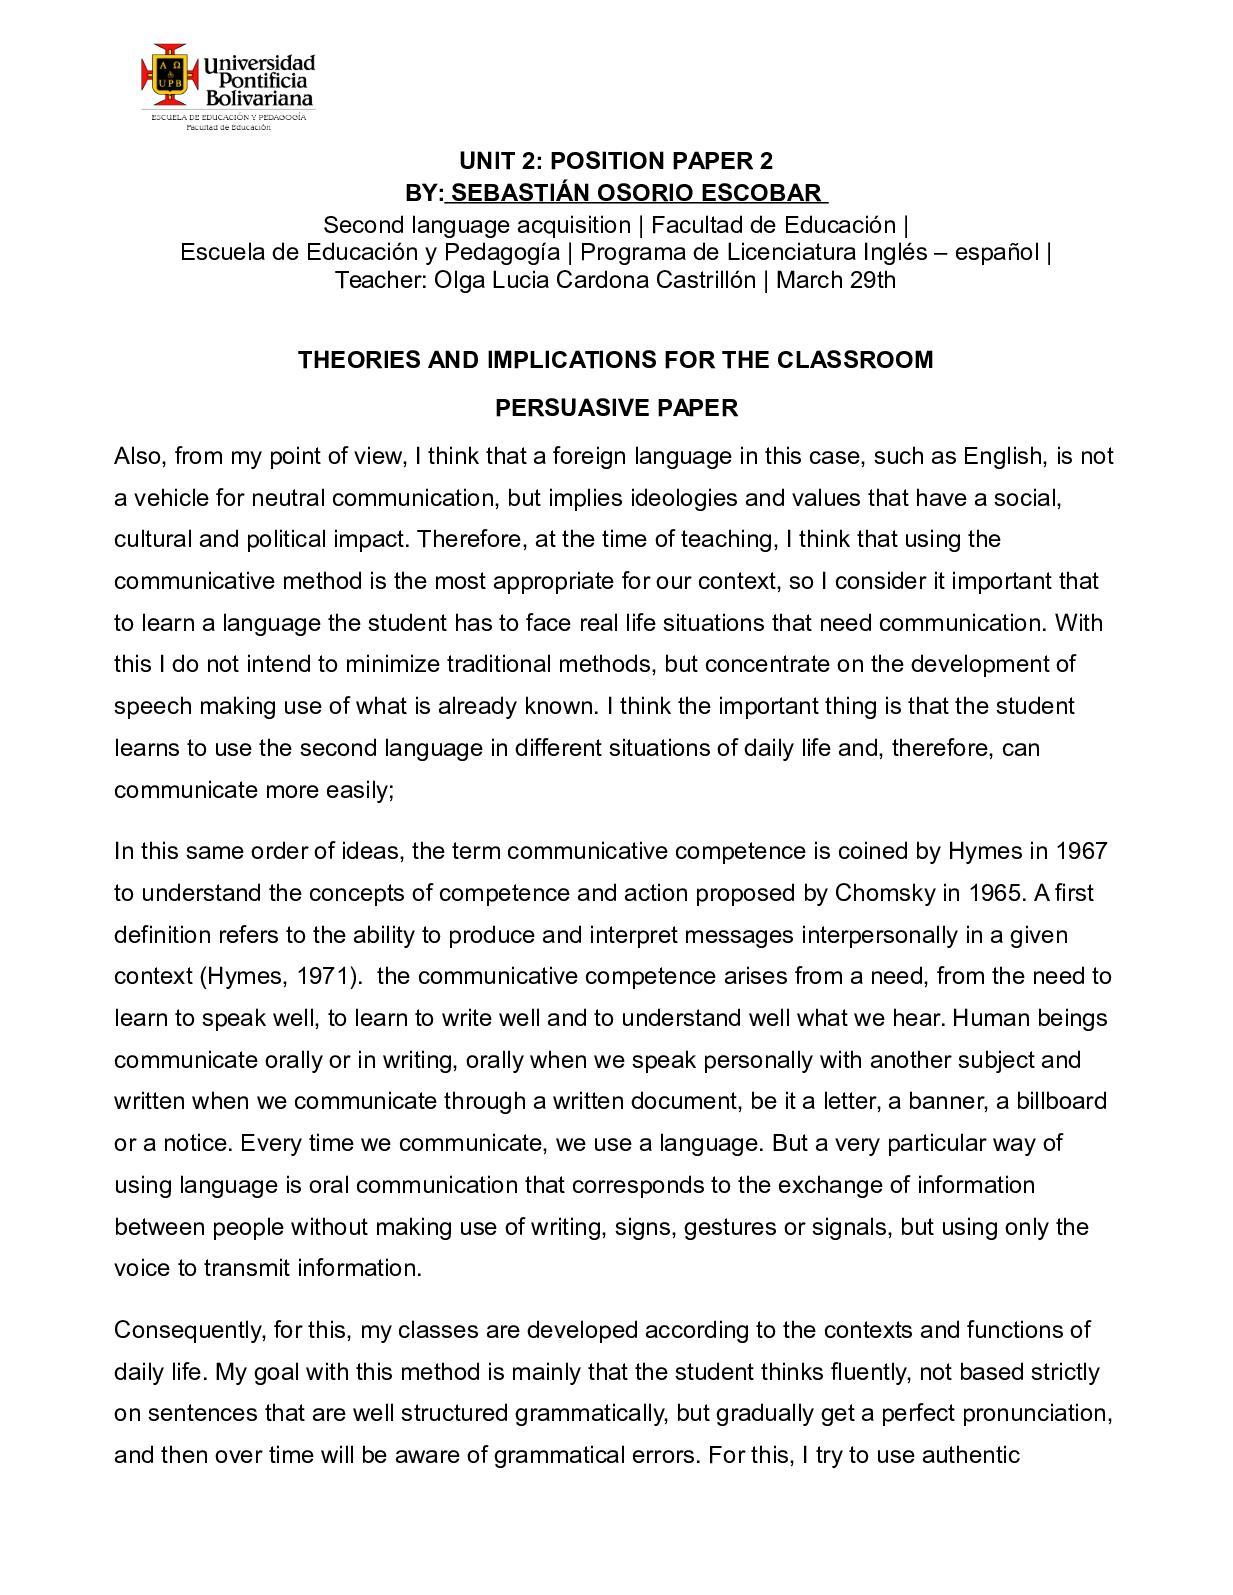 Calaméo - Sebastian Osorio Escobar Persuasive Paper